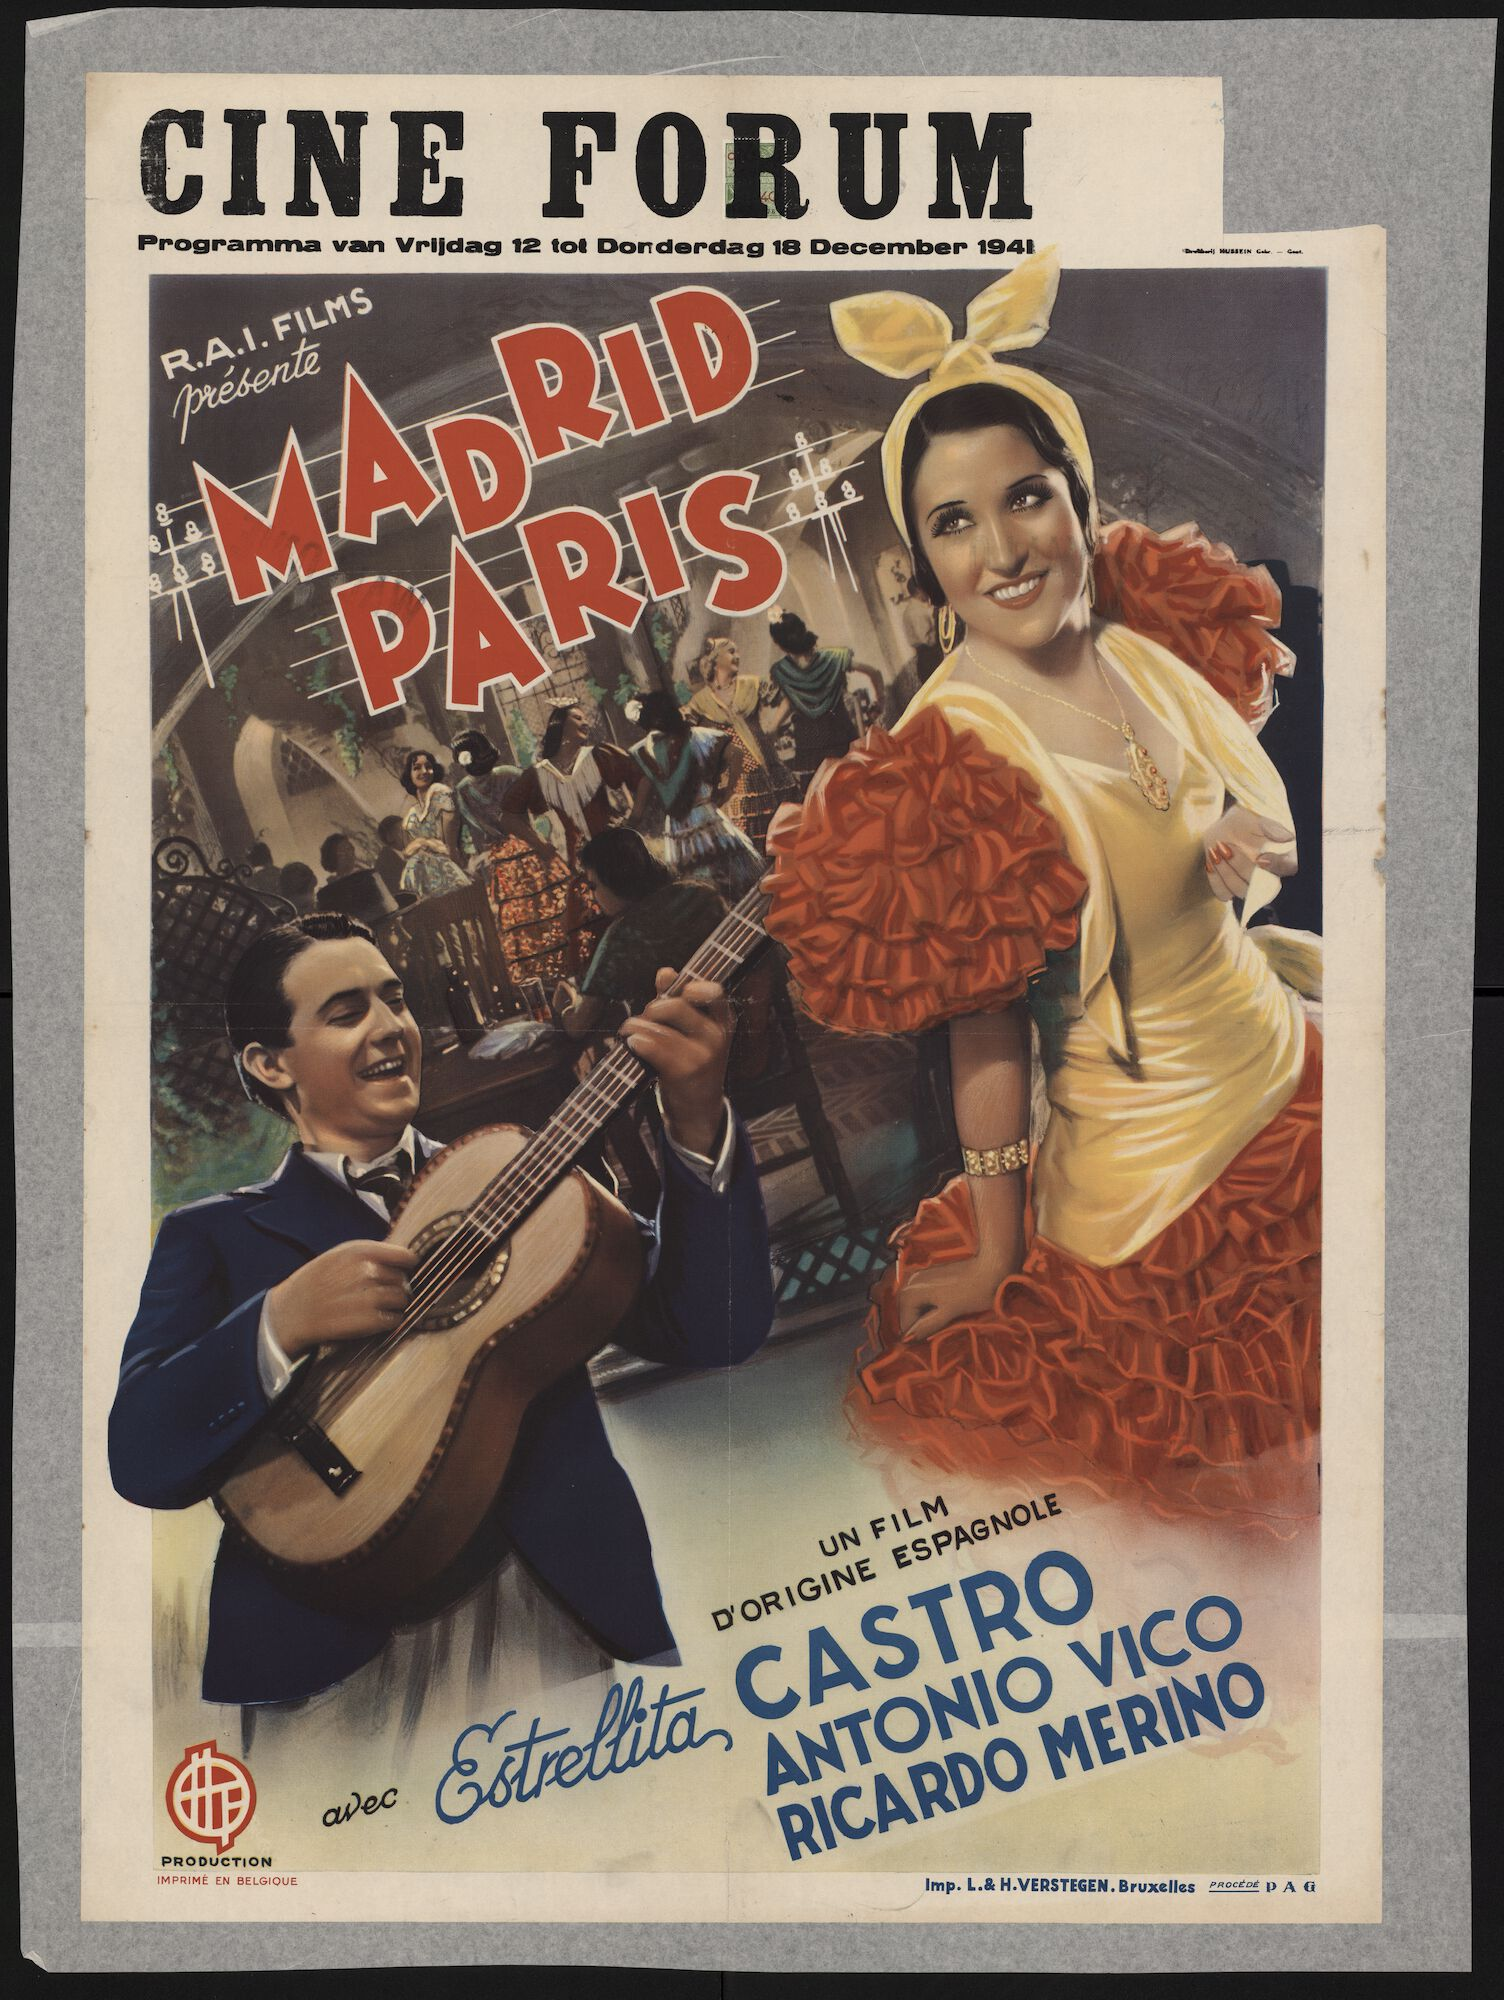 Madrid Paris, Ciné Forum, Gent, 12 - 18 december 1941